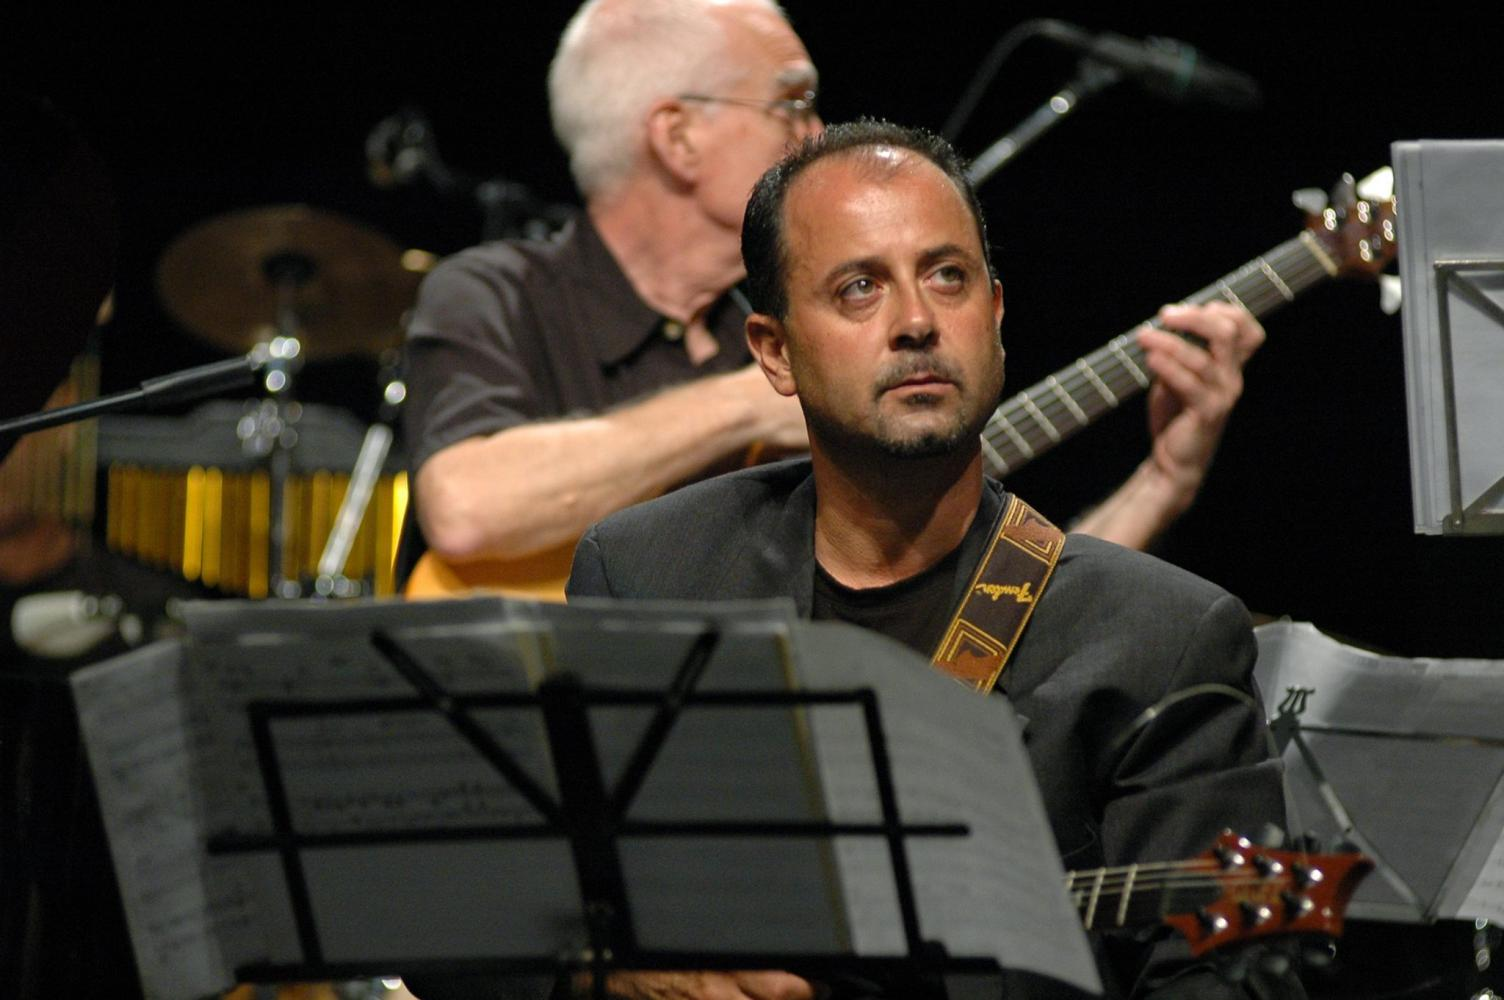 Roberto Tola